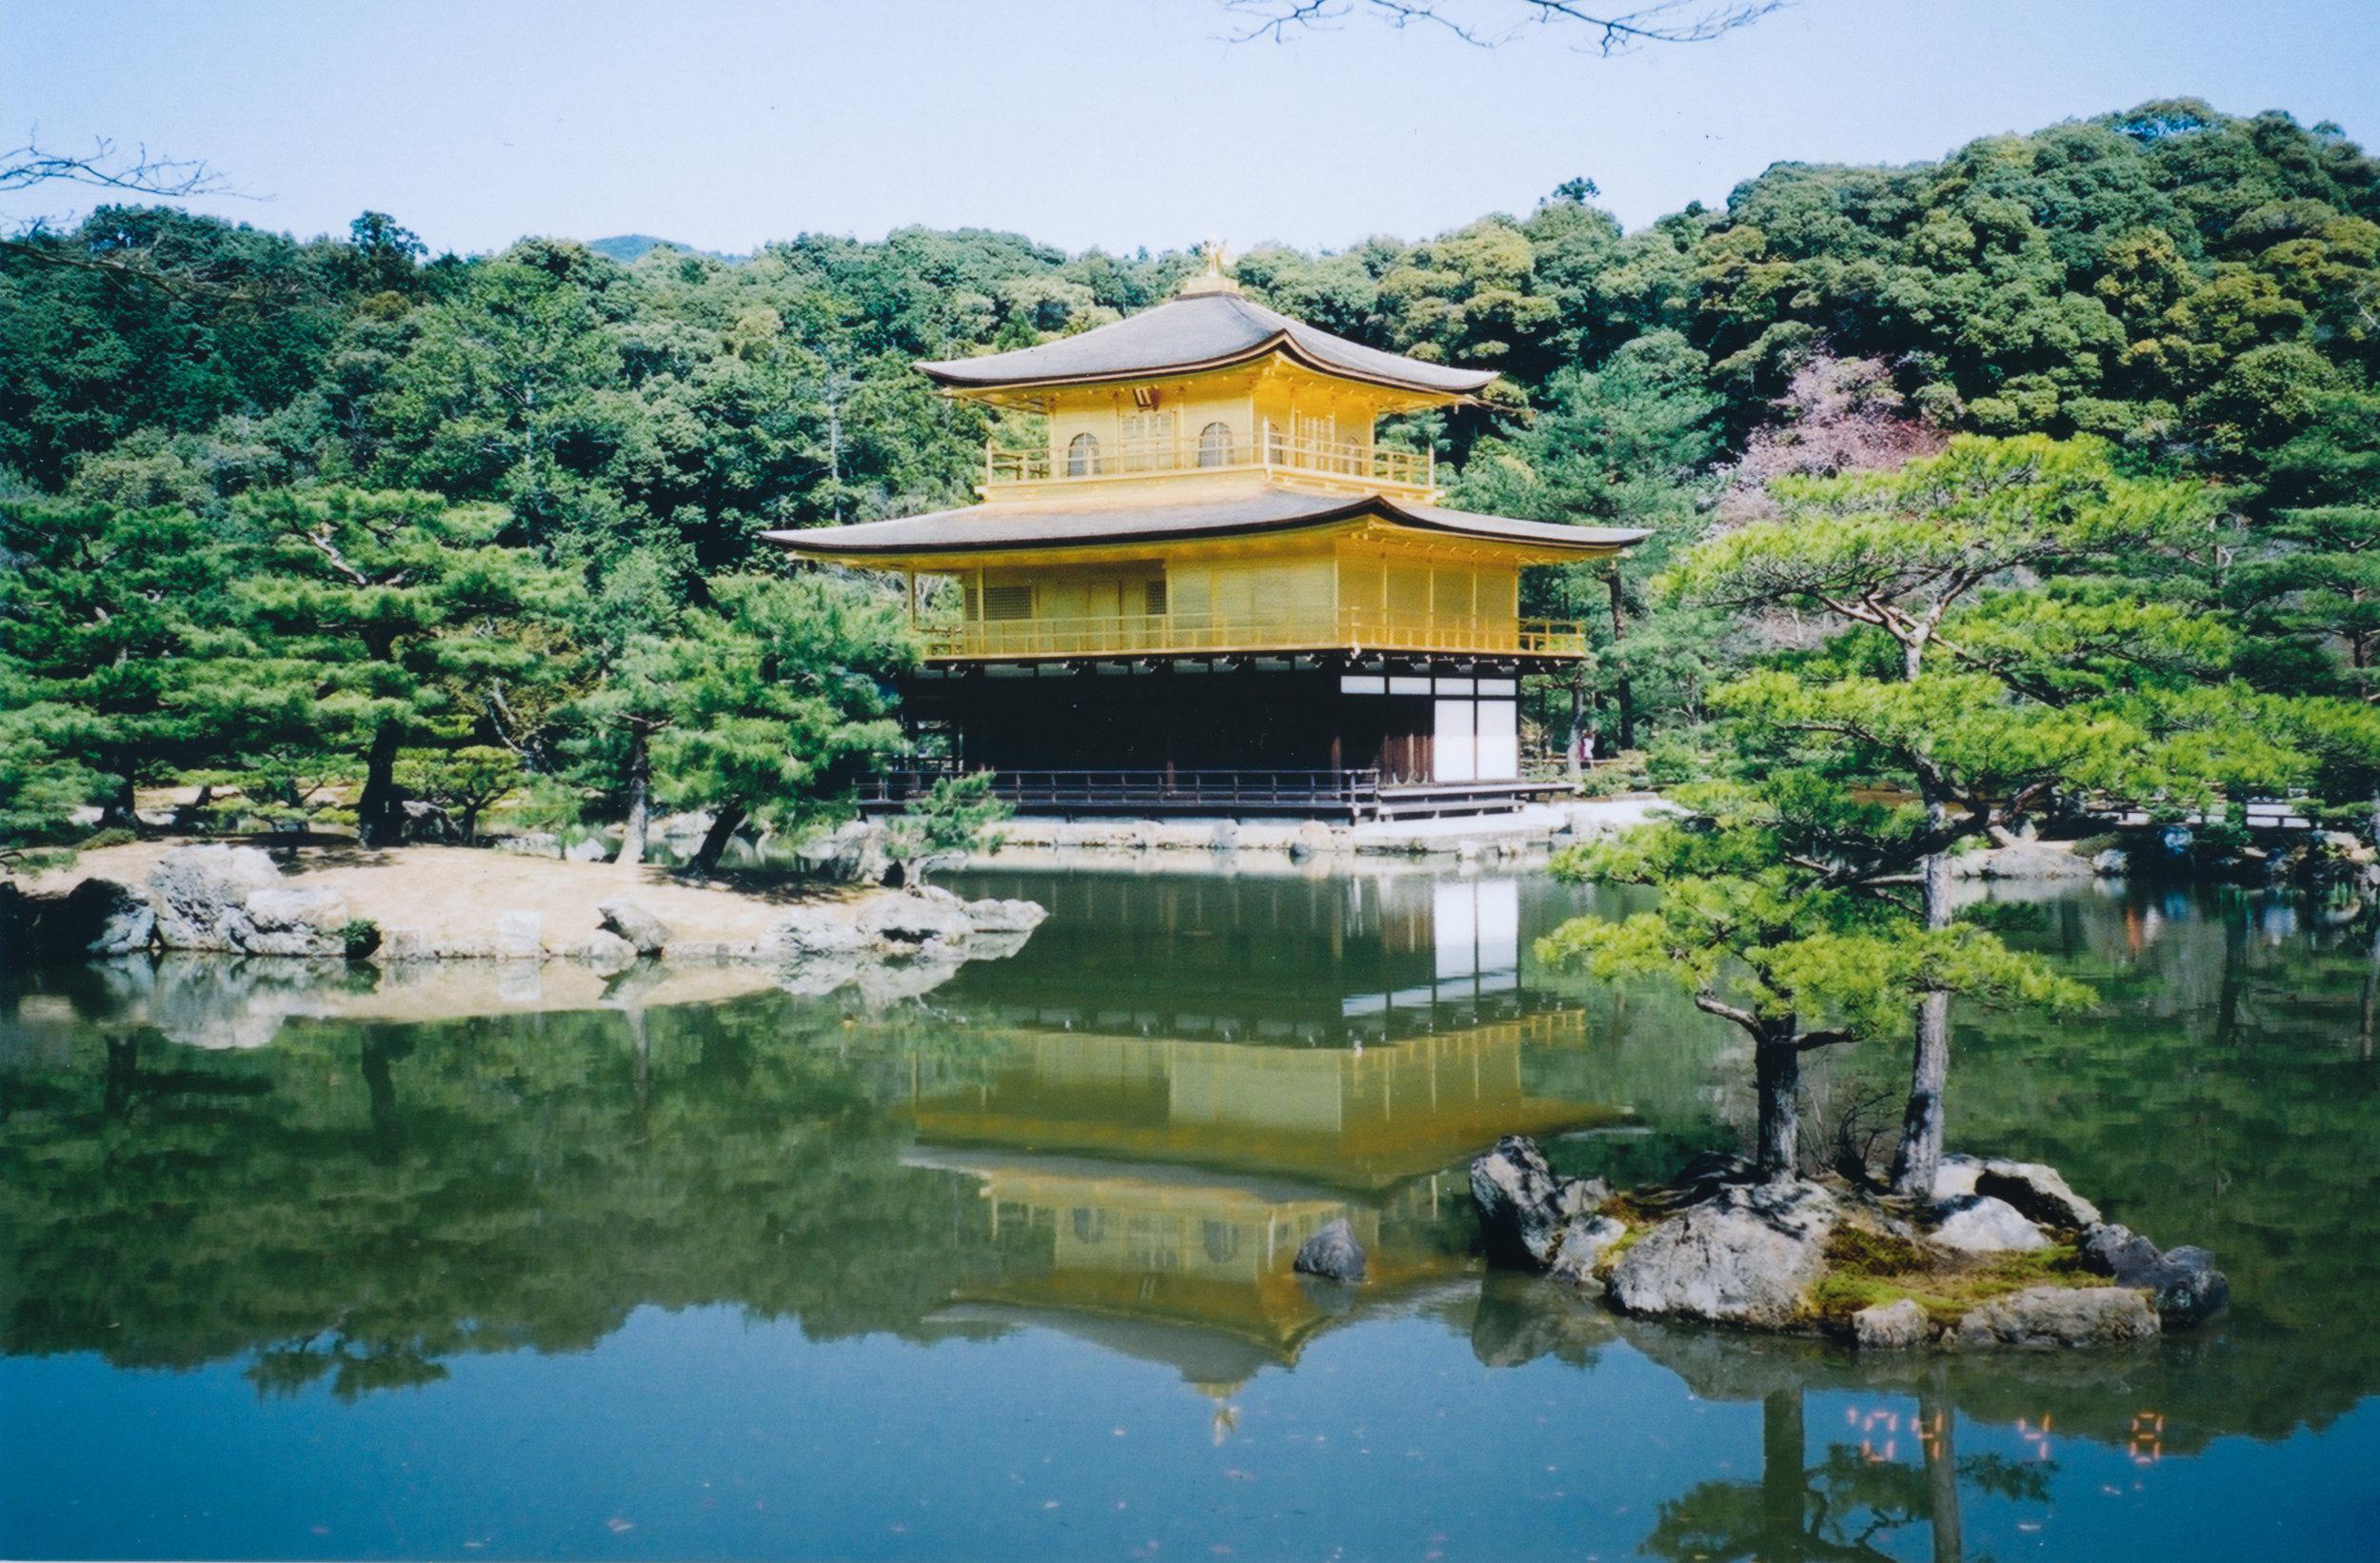 Japan - 35mm